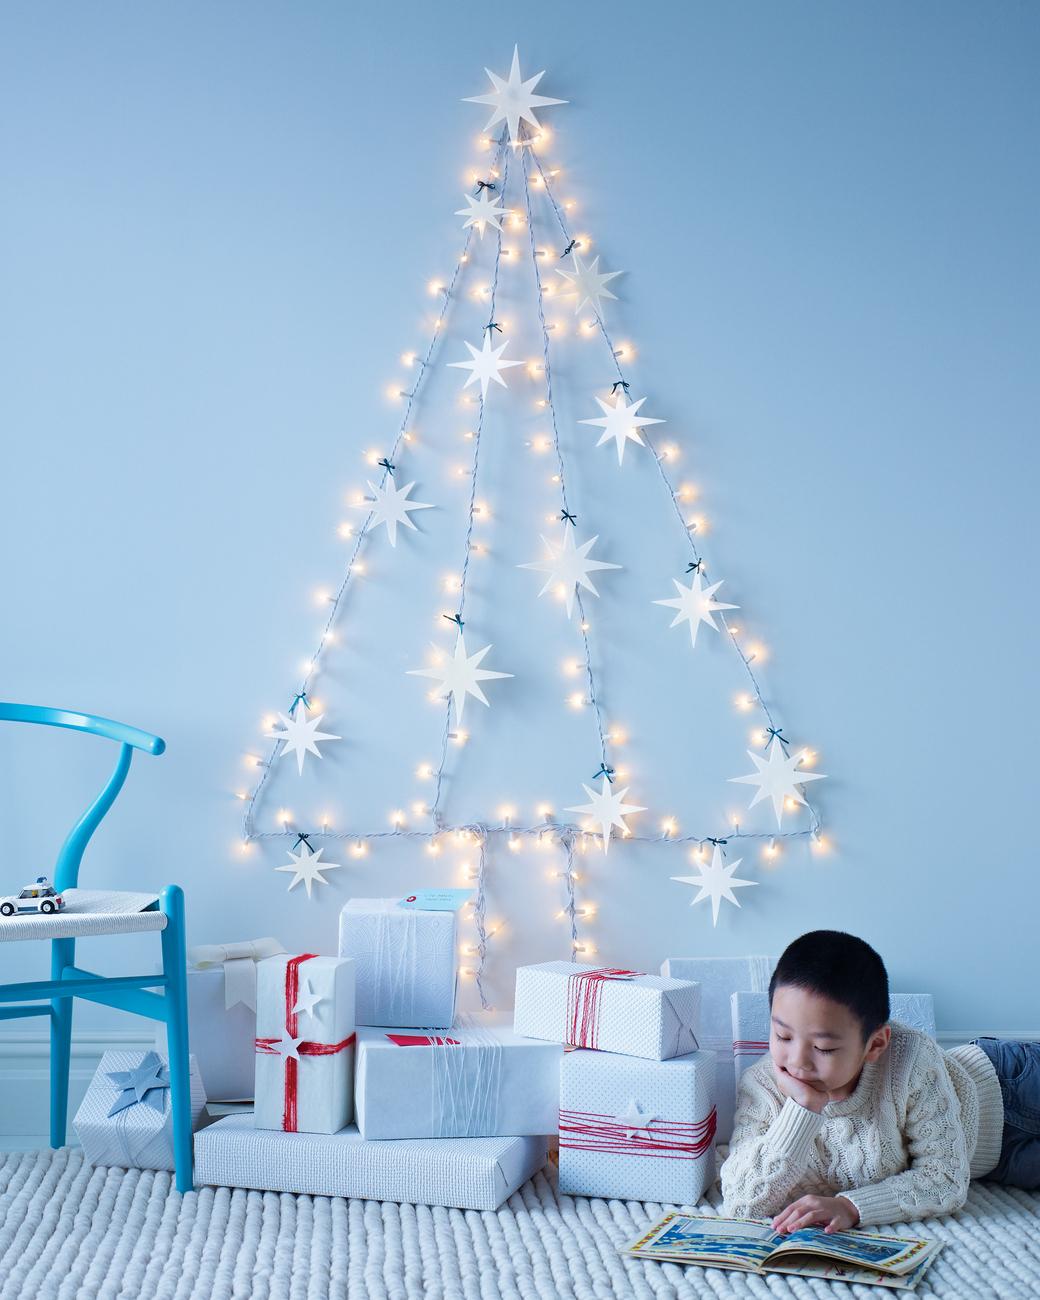 A DIY Christmas tree made from Christmas lights as seen on Martha Stewart.